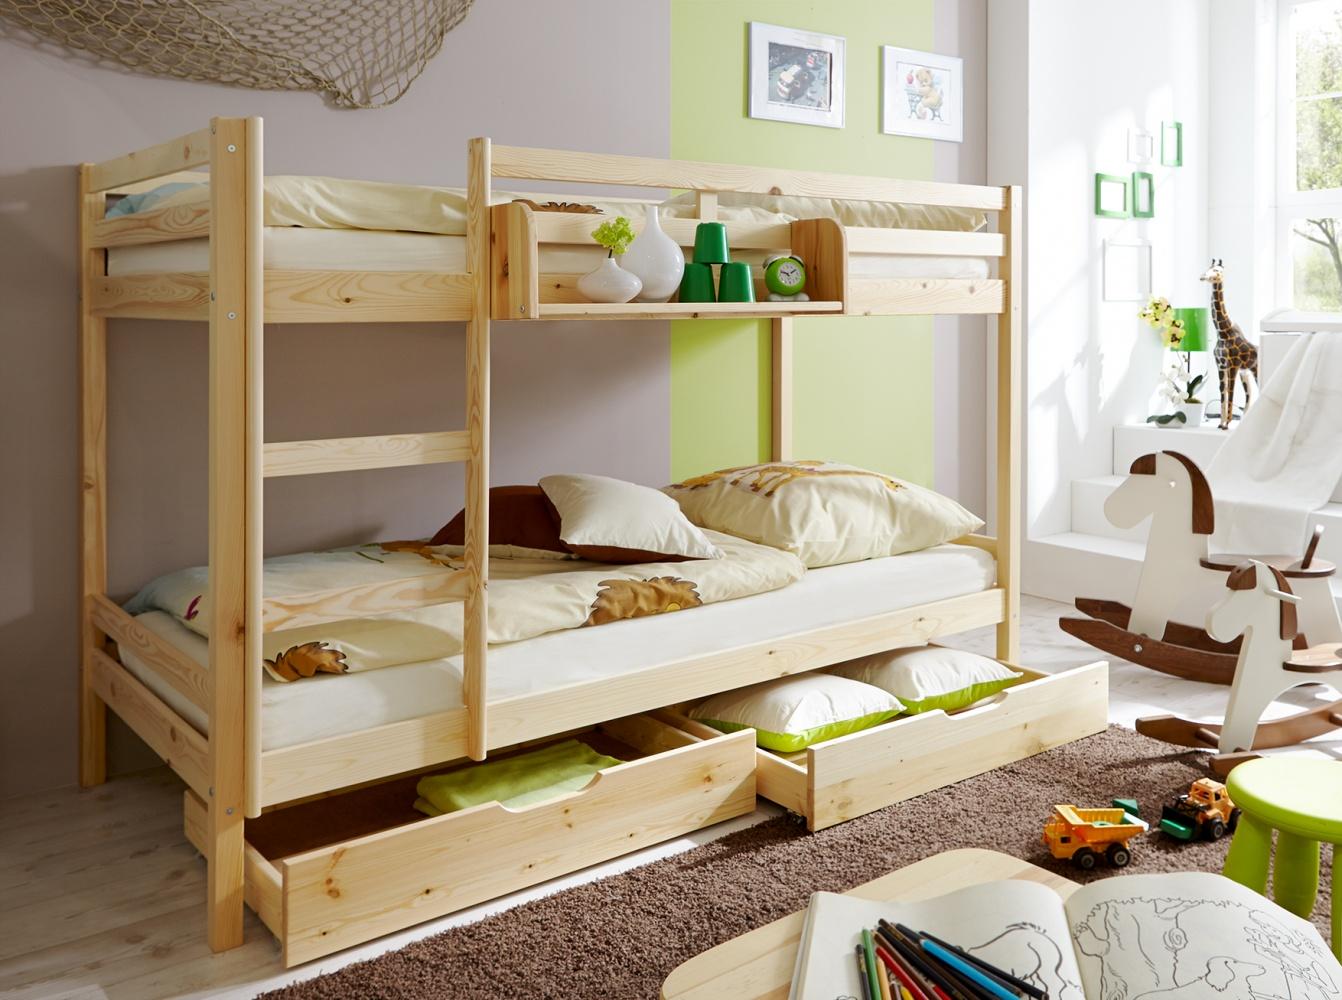 Etagenbett Kiefer Massiv : Jugend etagenbett kiefer massiv noah kaufen bei möbel lux